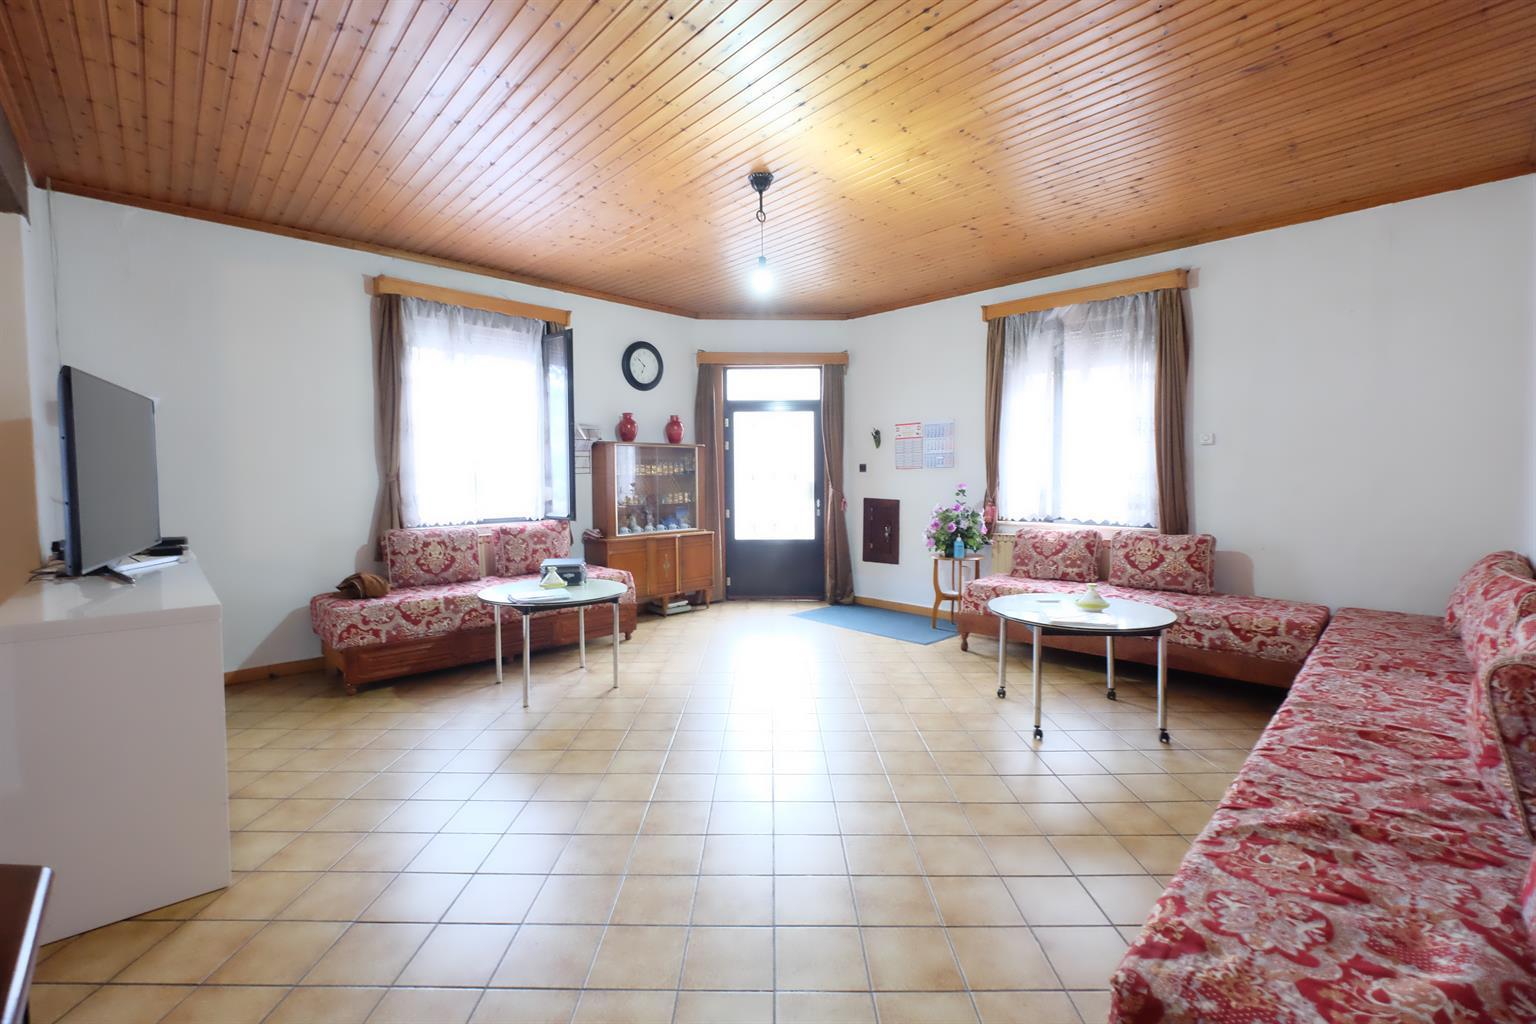 Maison - Colfontaine - #4501144-4